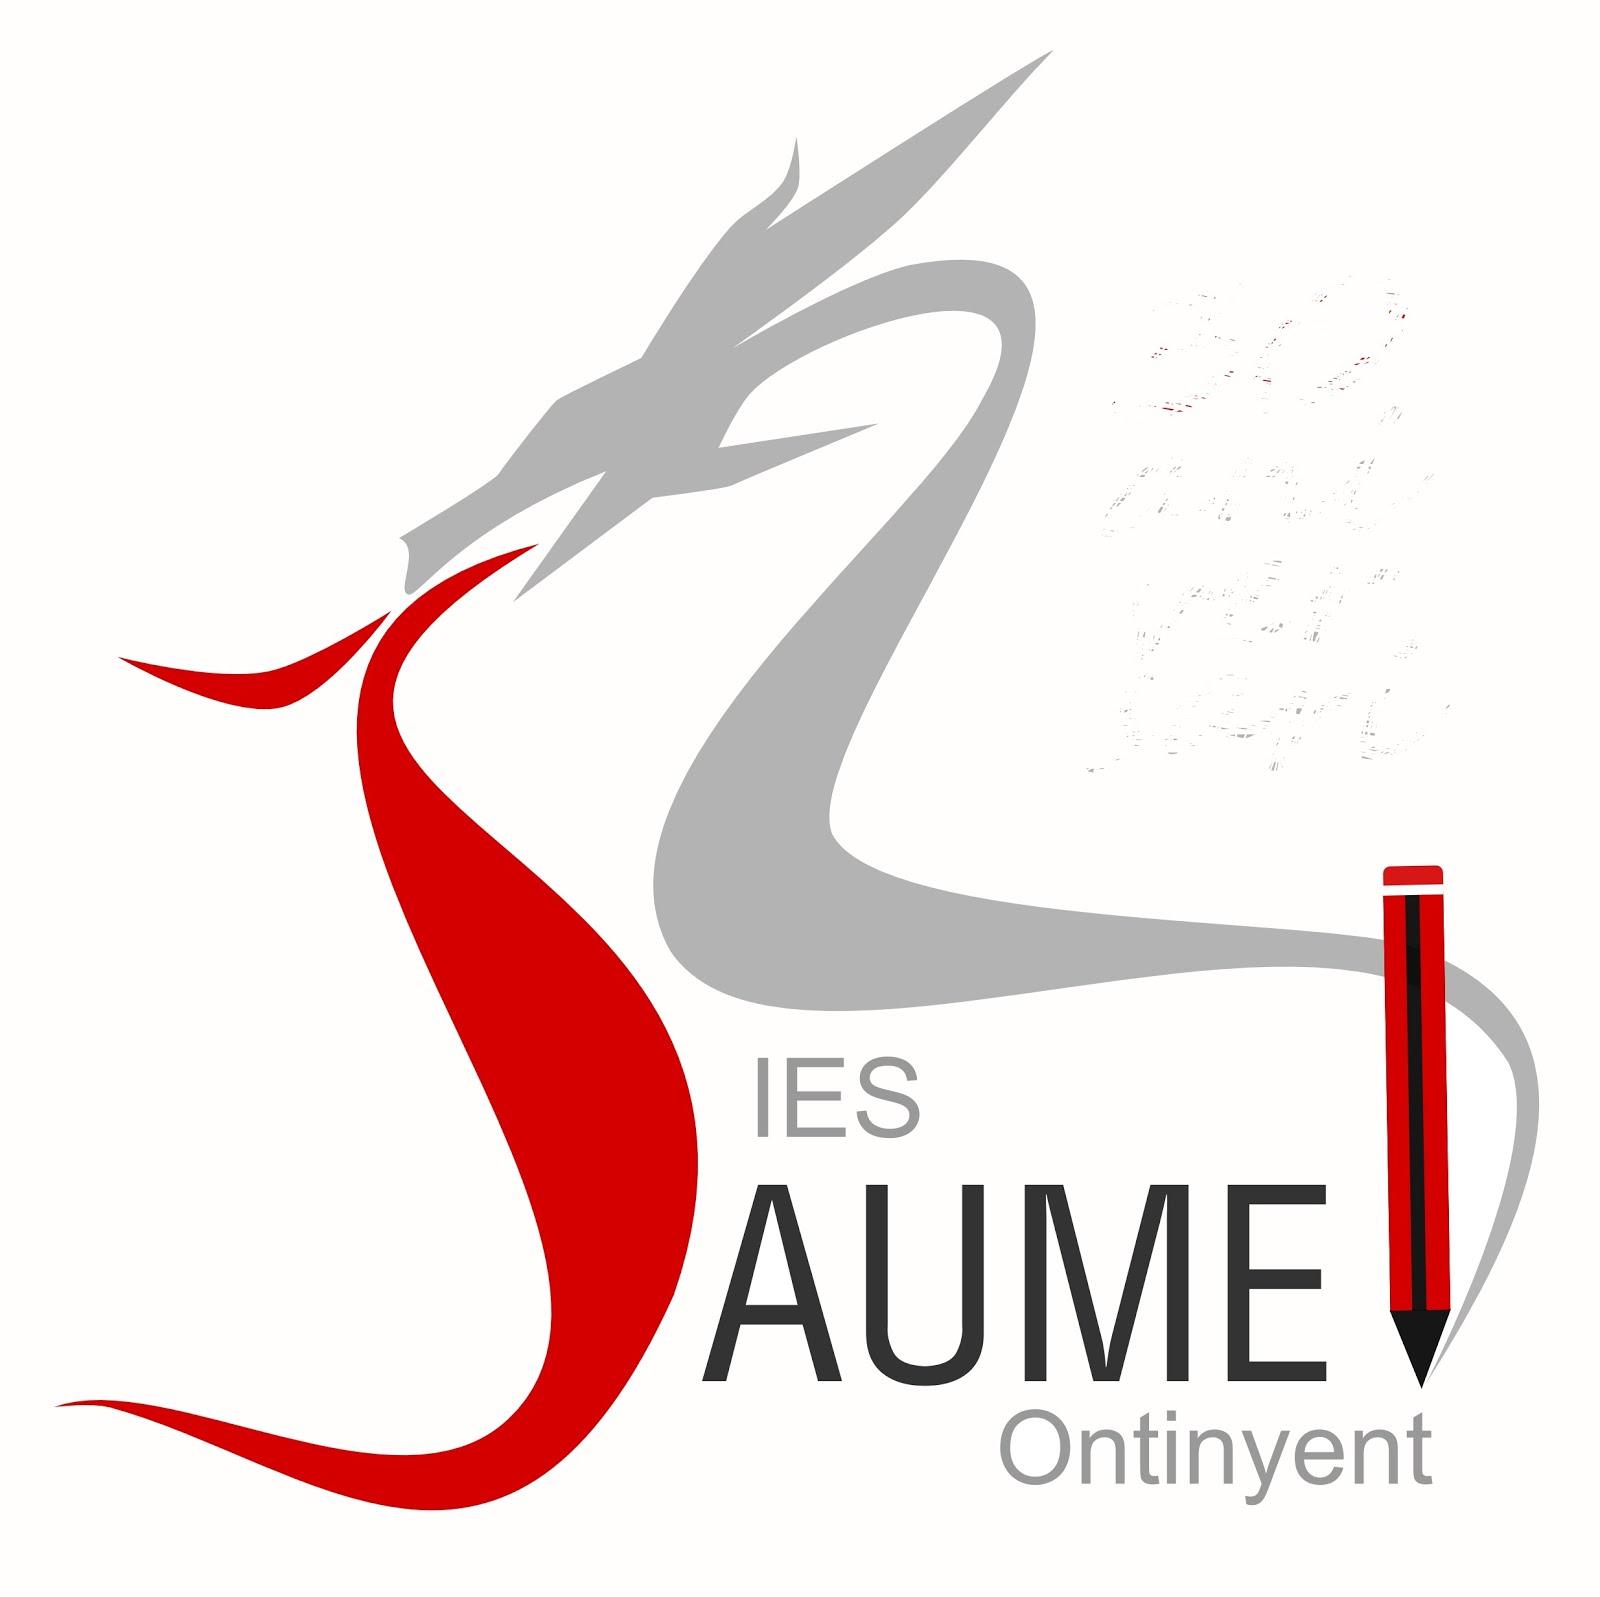 IES JAUME I Ontinyent